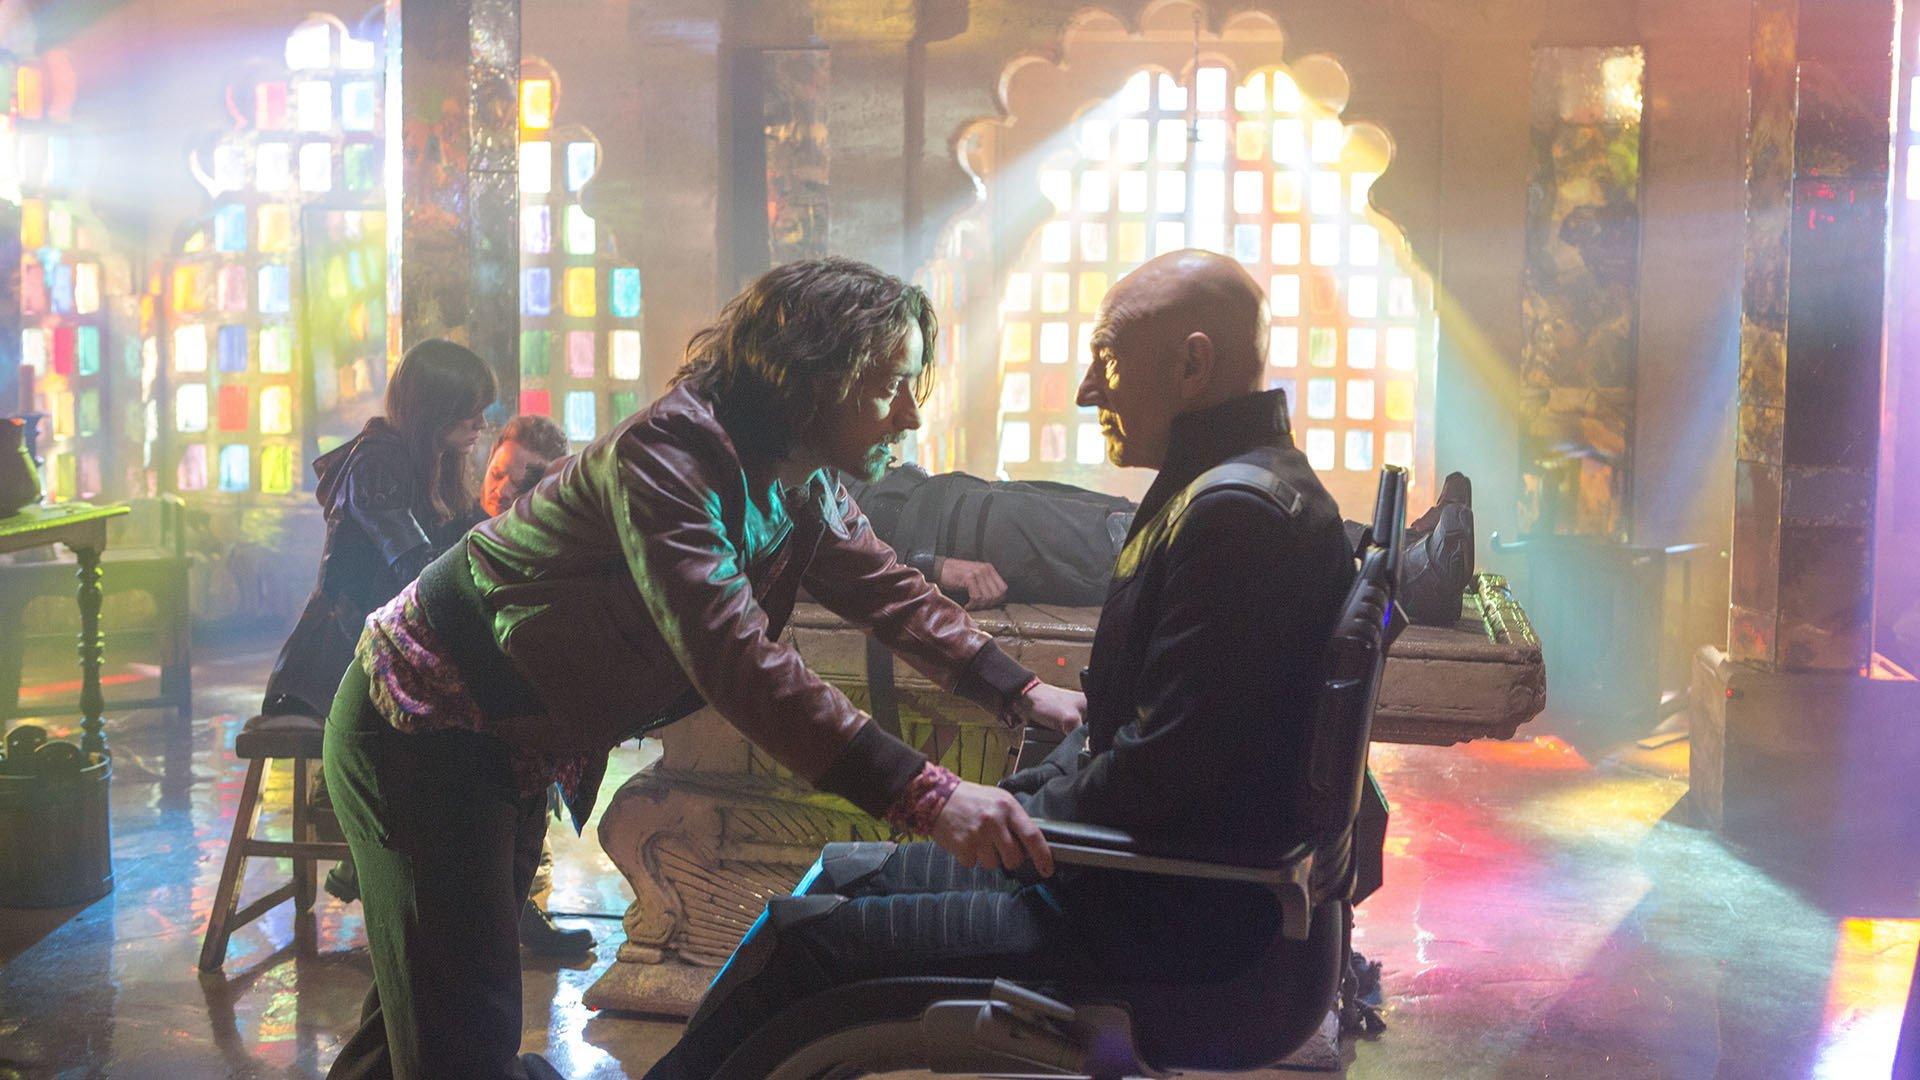 X-Men: Days of Future Past backdrop